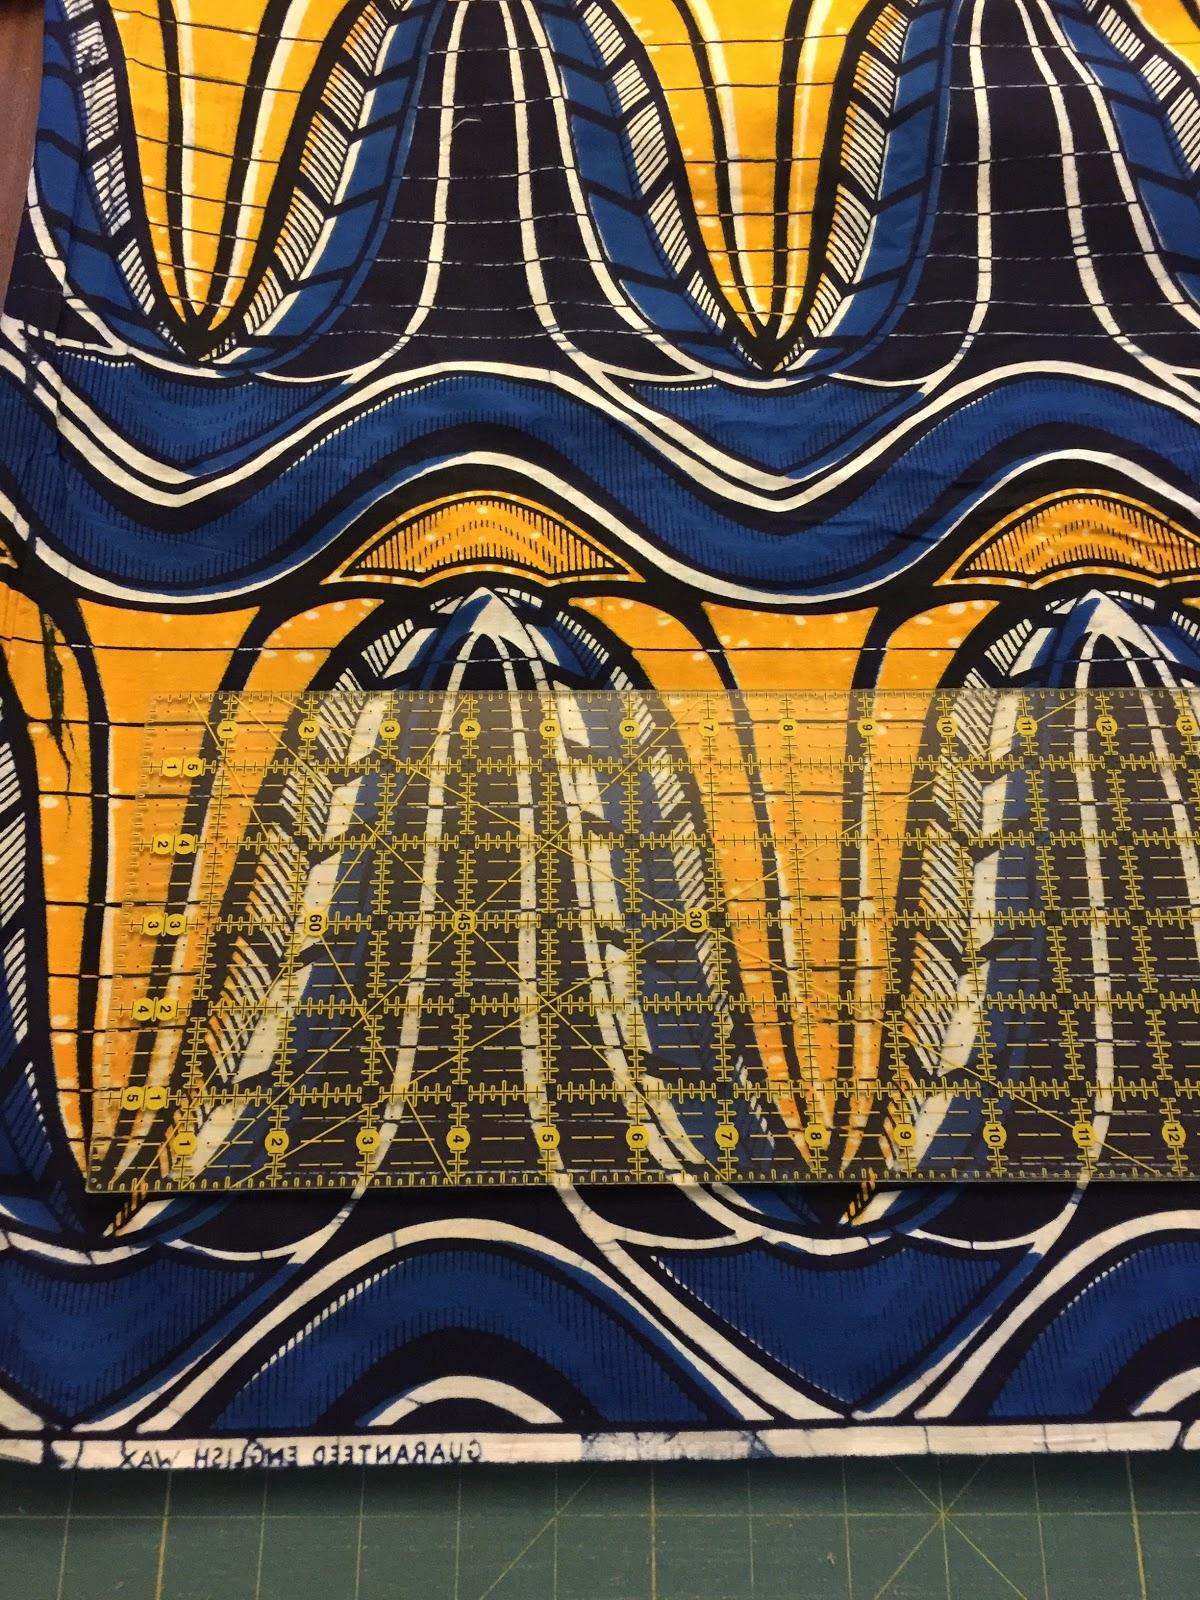 english wax batik 8 vertical repeat 13 repeat across wof